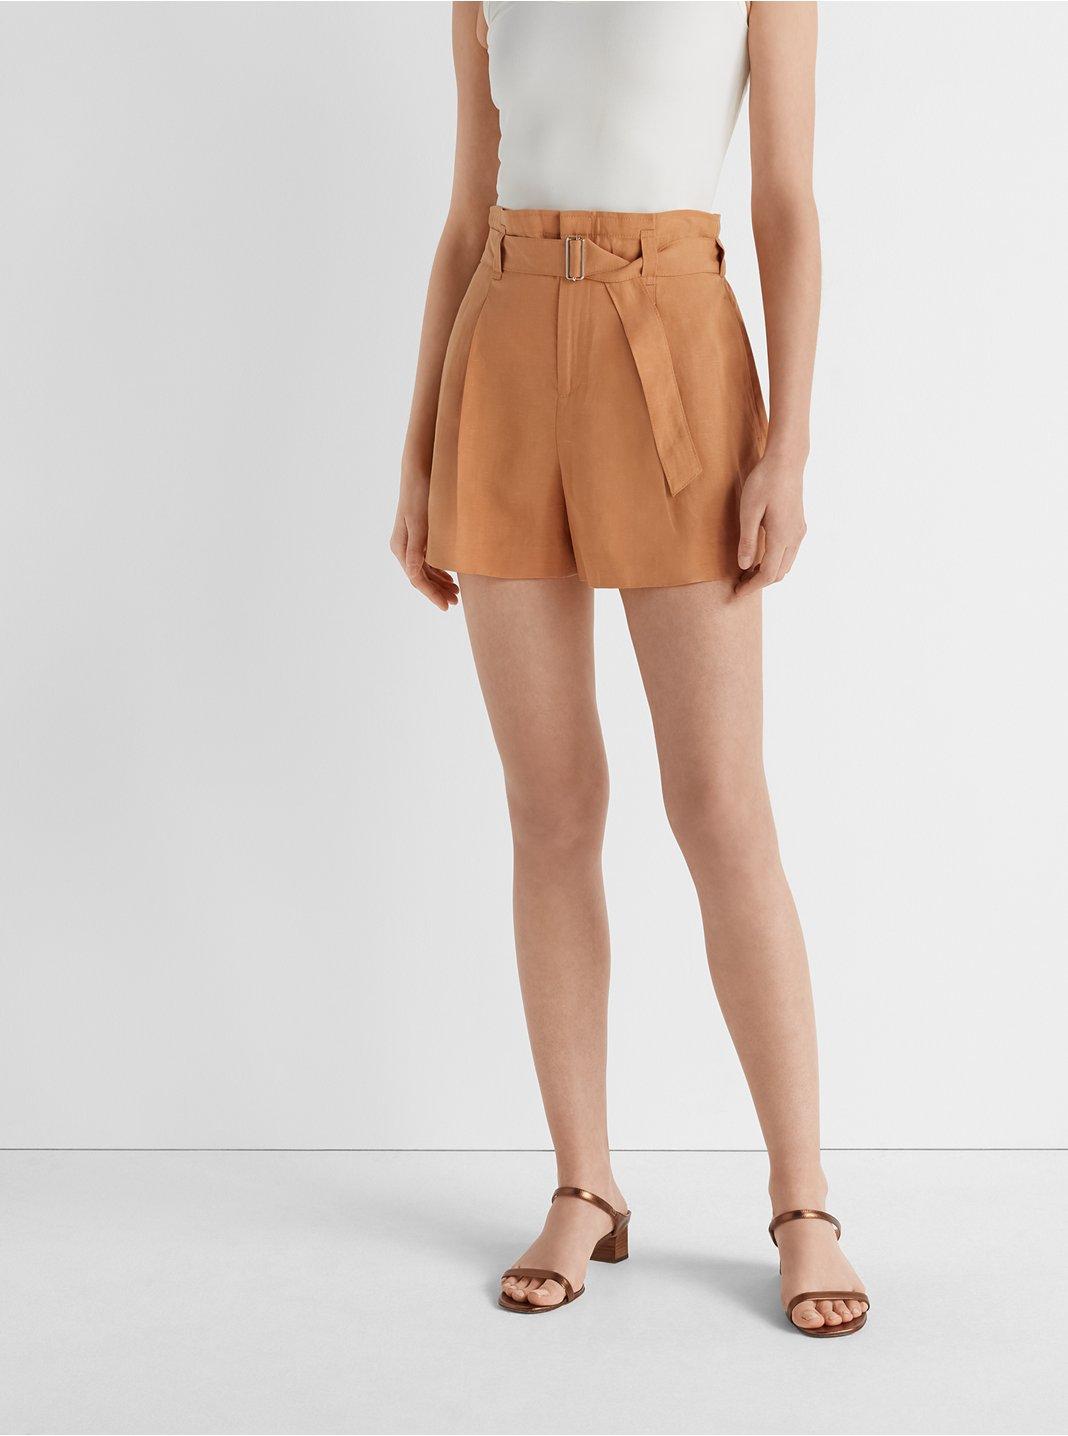 Darcee Shorts